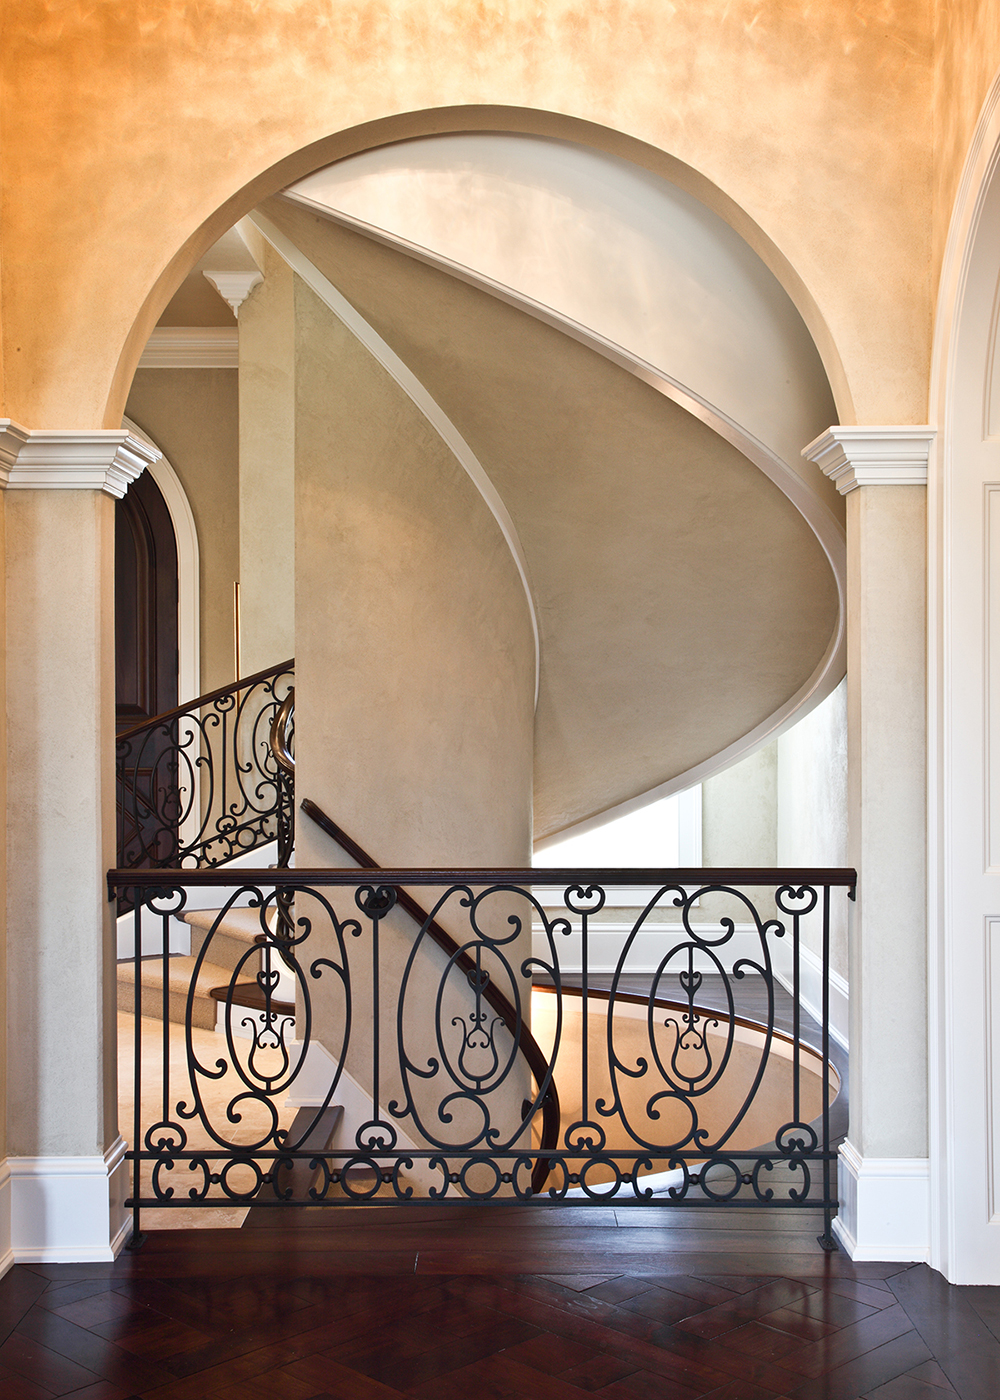 bauer-metal-architectural-fabrication-minnesota-mn-metalwork-on-site-welding-fabricator-welder-blacksmith-wrought-iron-custom-stairs-railings-ornamental-cable-2.jpg